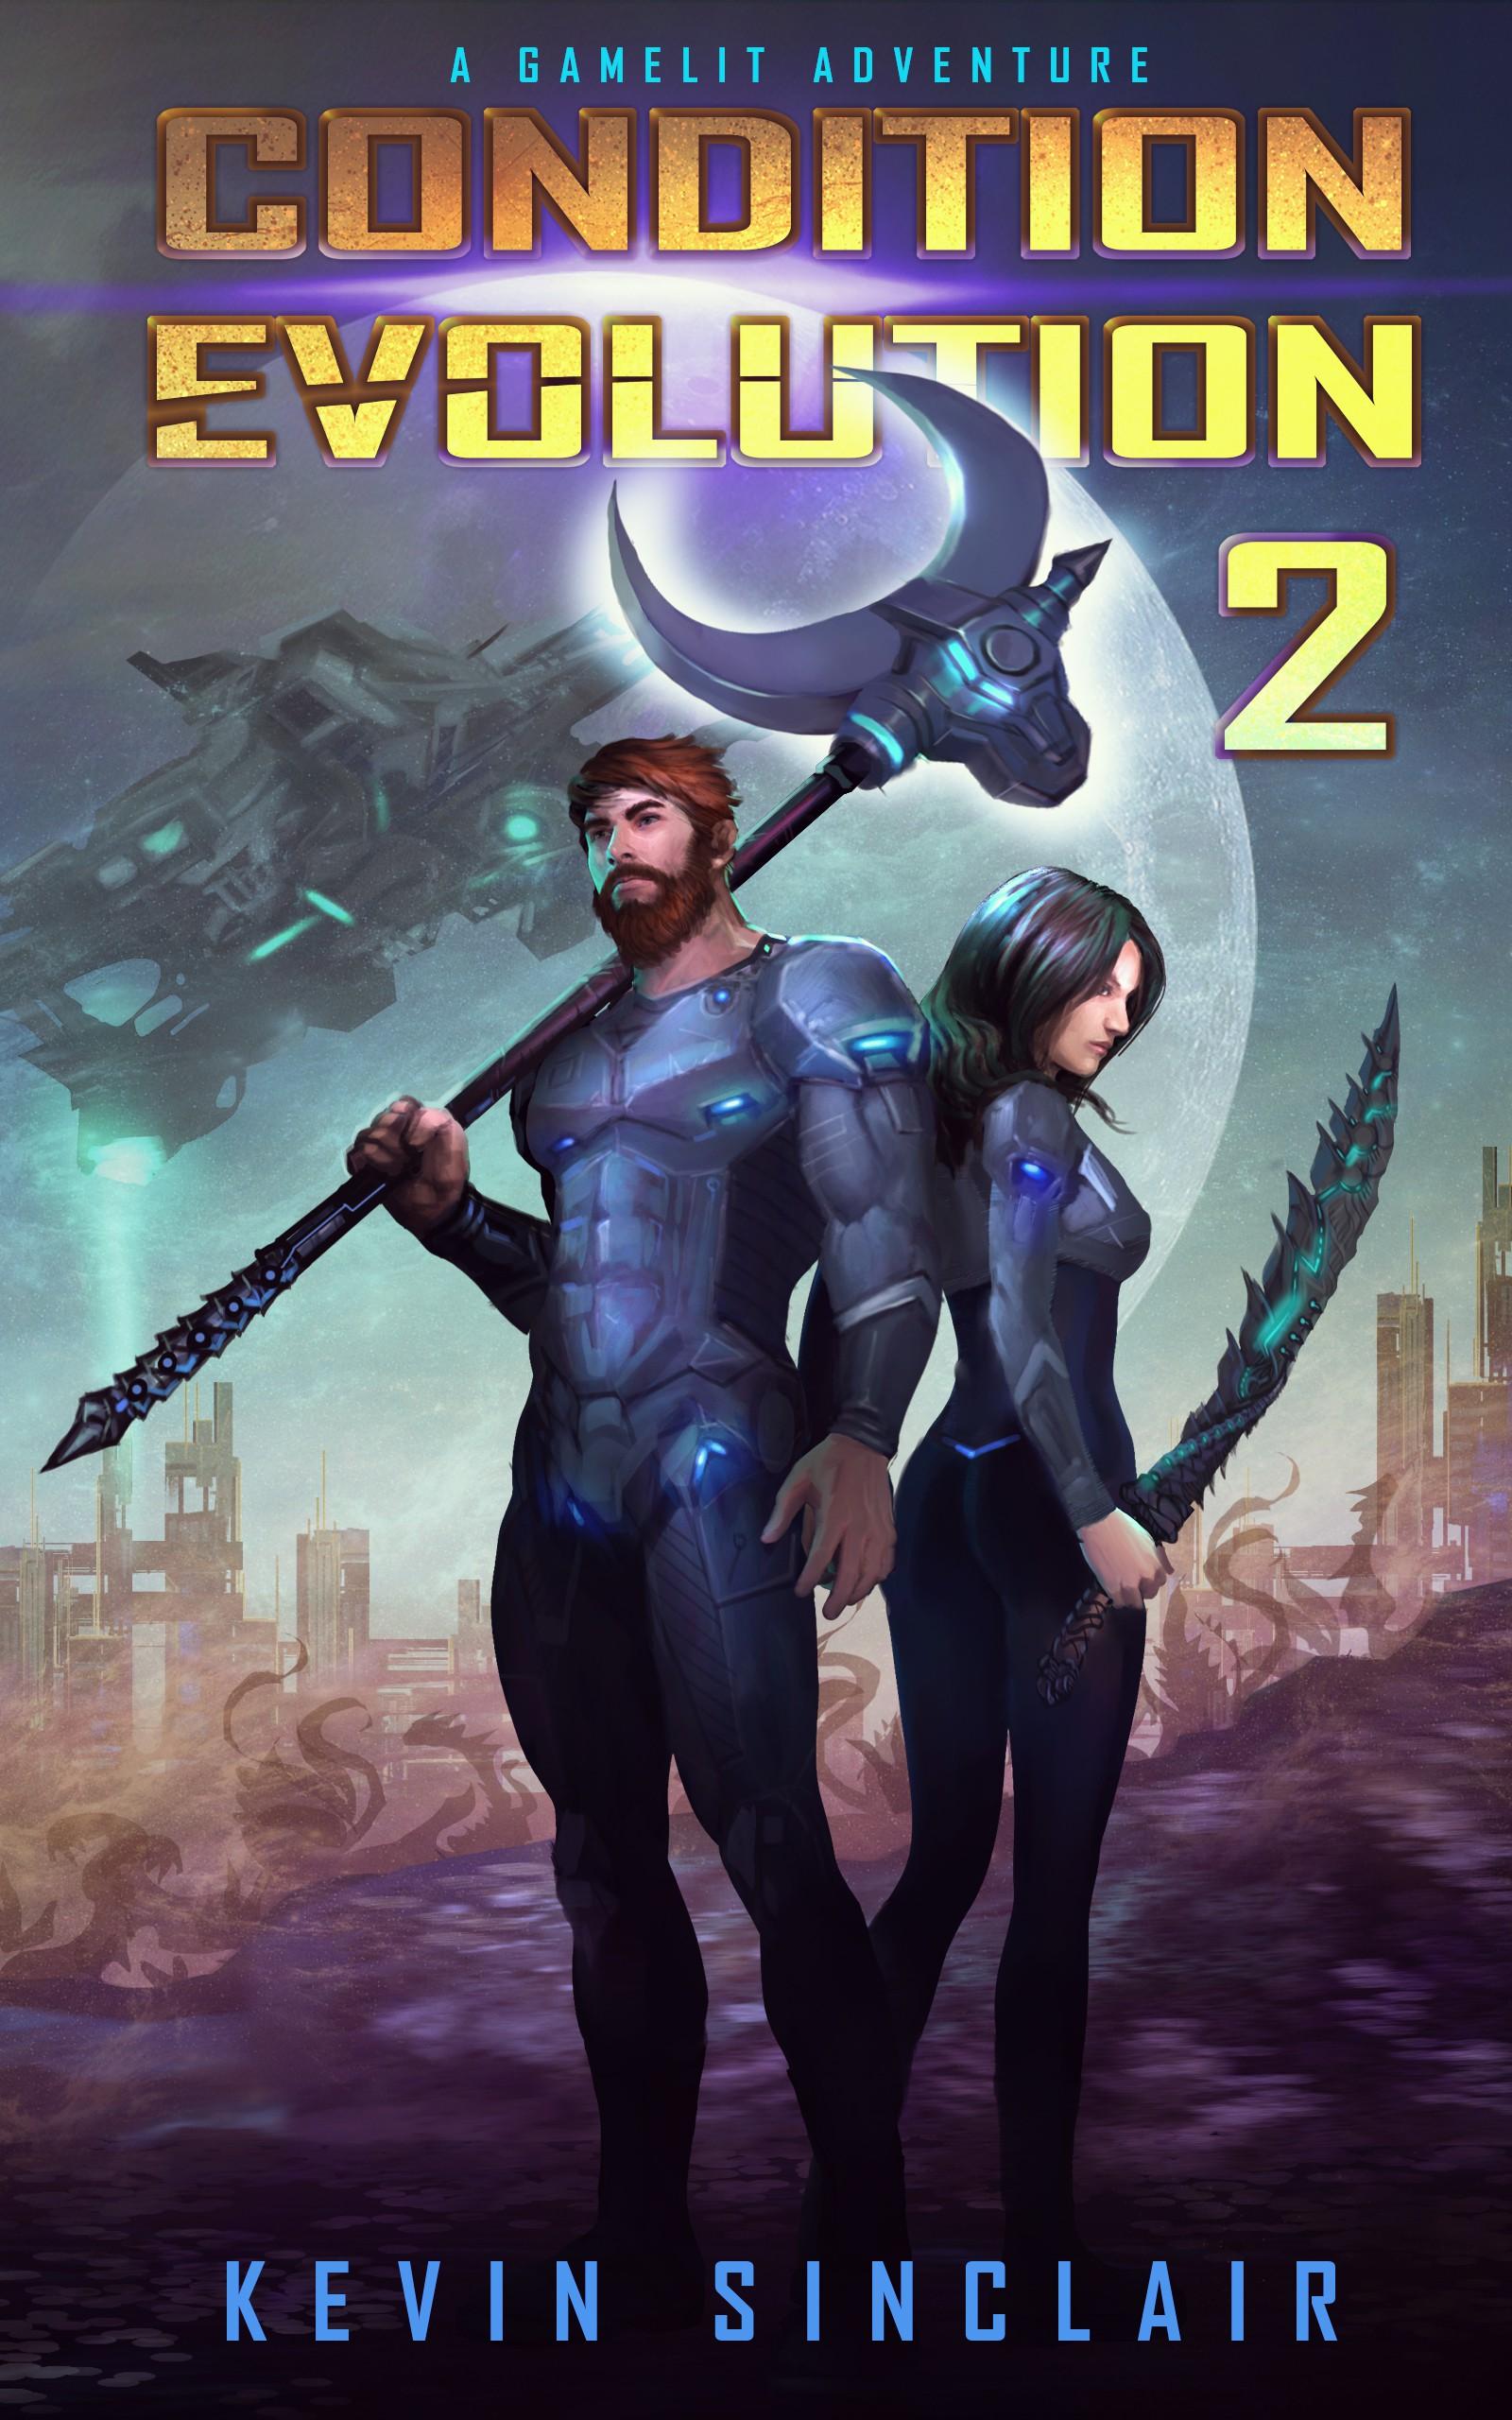 Game-Lit Sci-fi E-book Cover